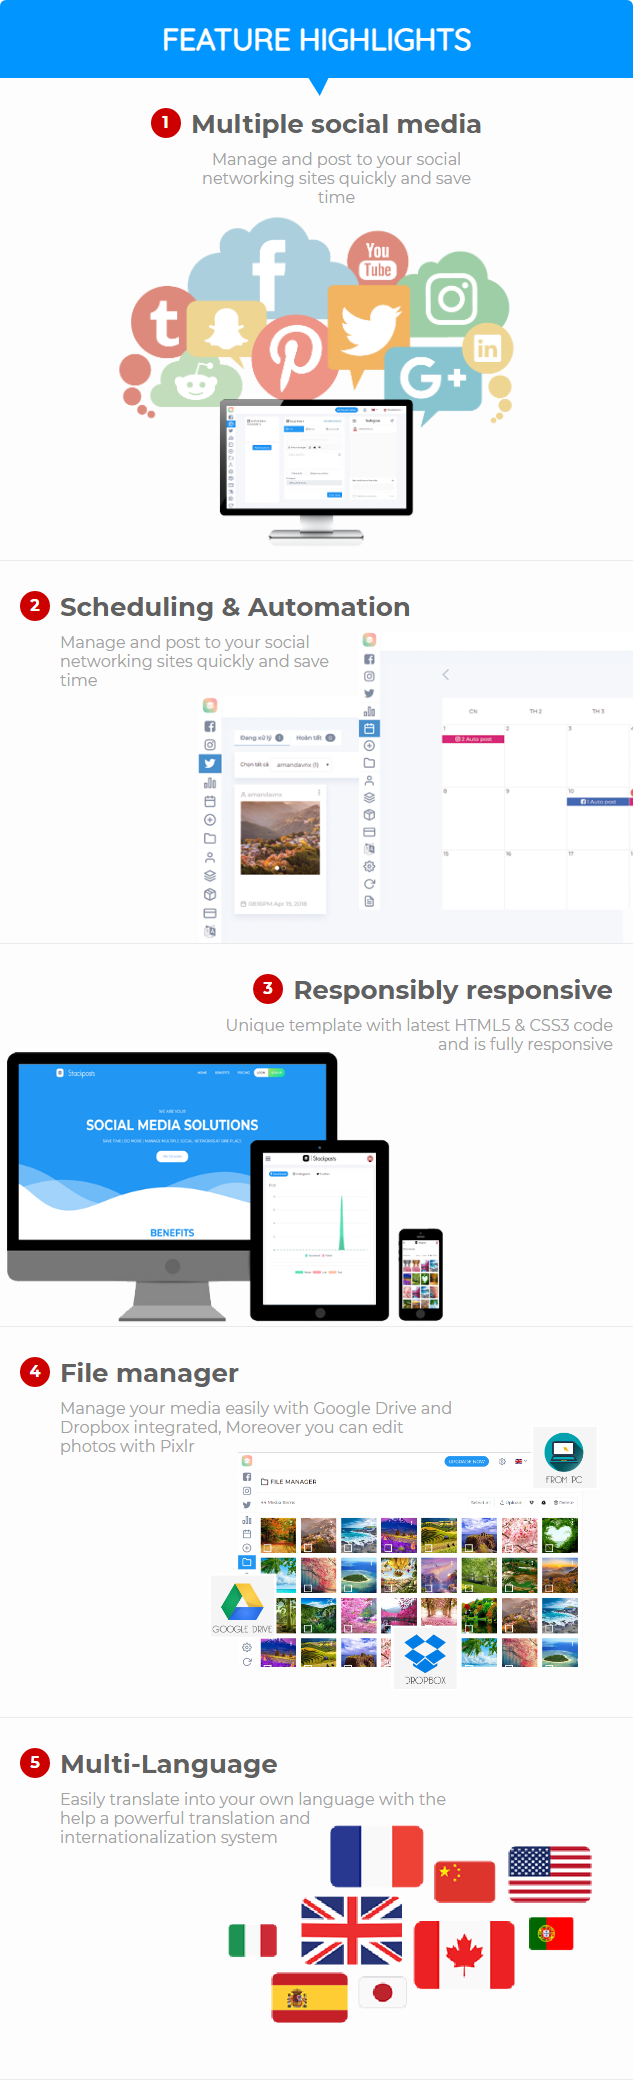 Stackposts - Social Marketing Tool - 6